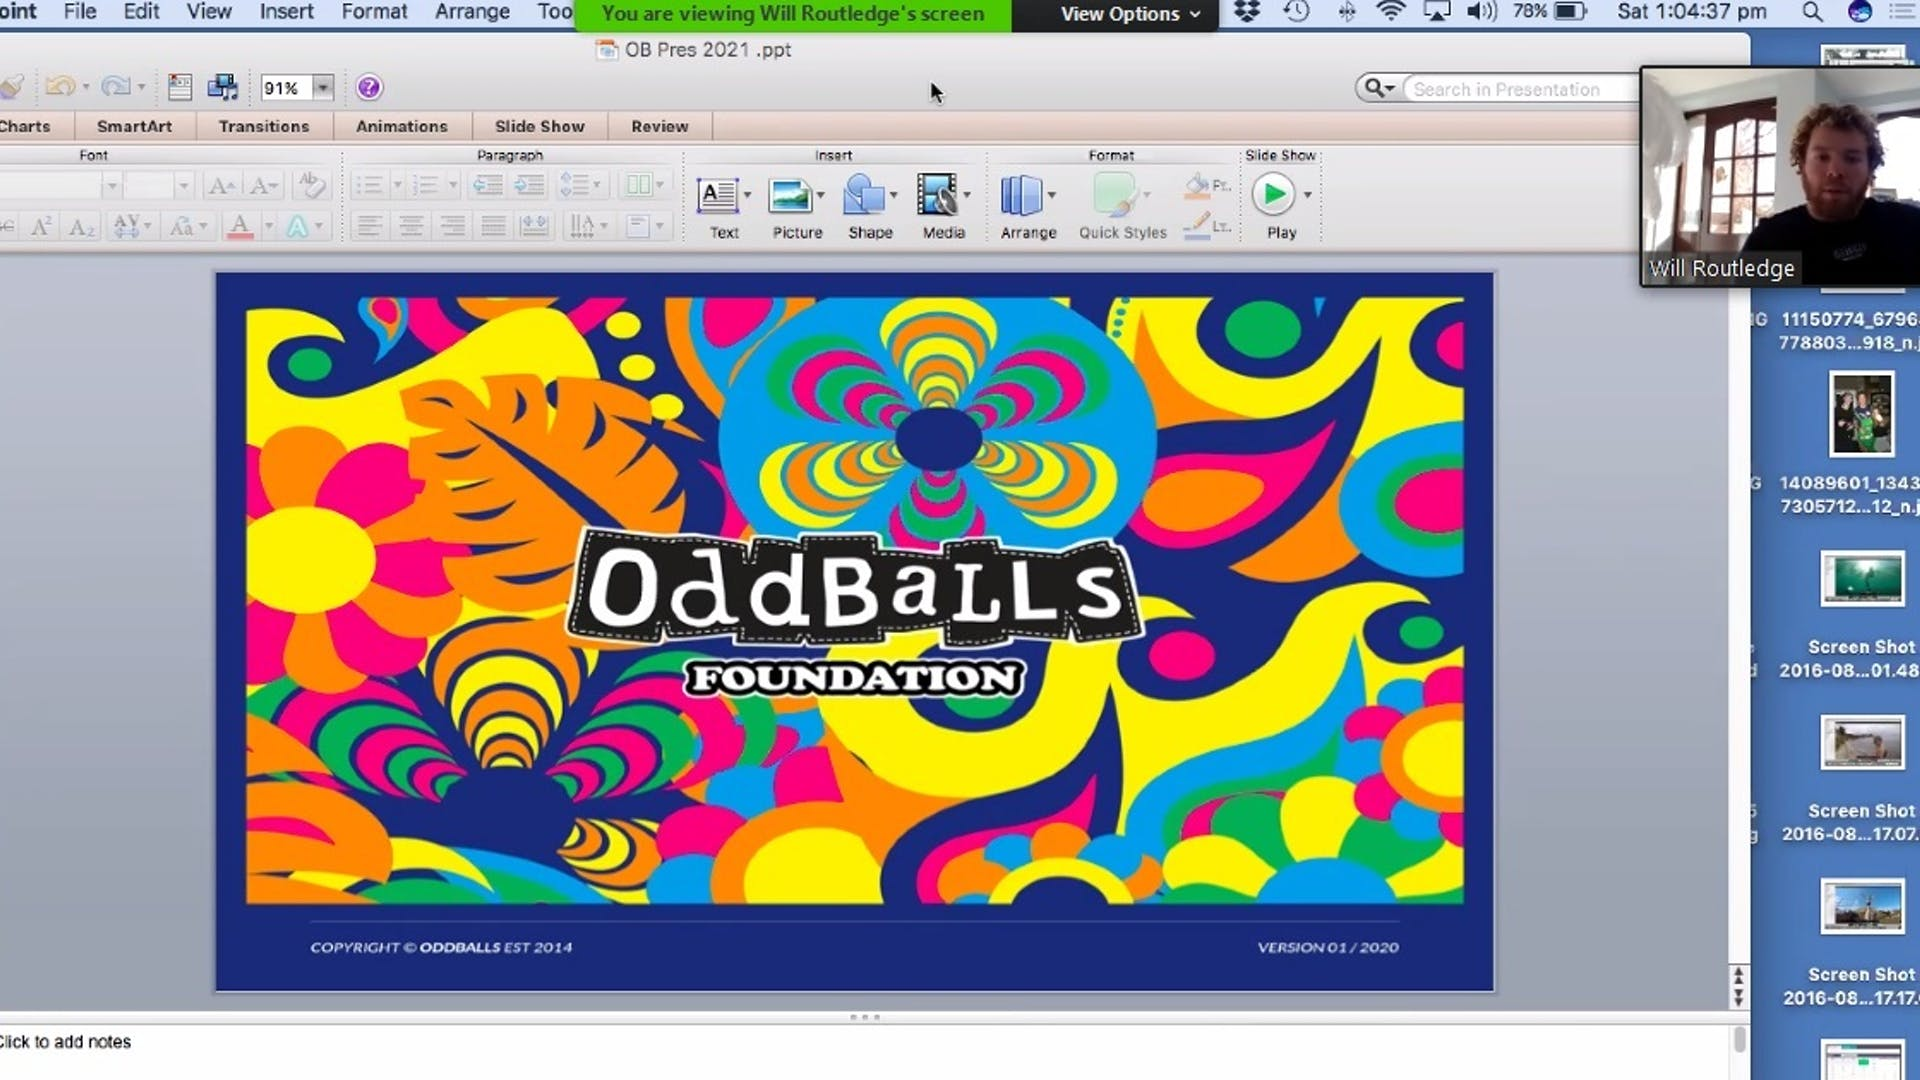 ODDBALLS presentation 1